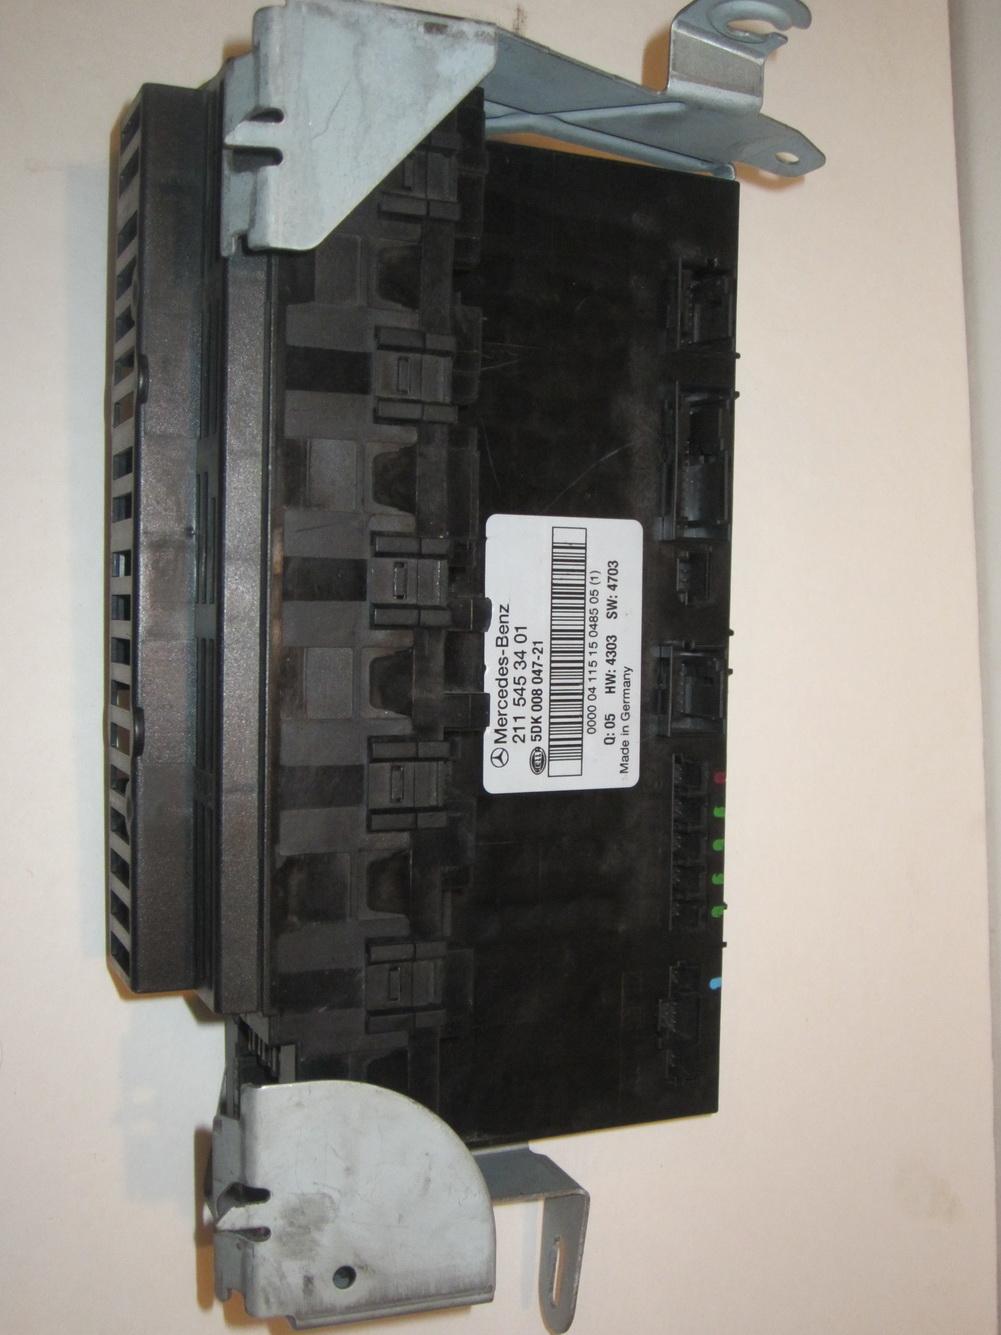 Mercedes Benz Sam Control Fuse Box 2115453401 Used Auto Parts German